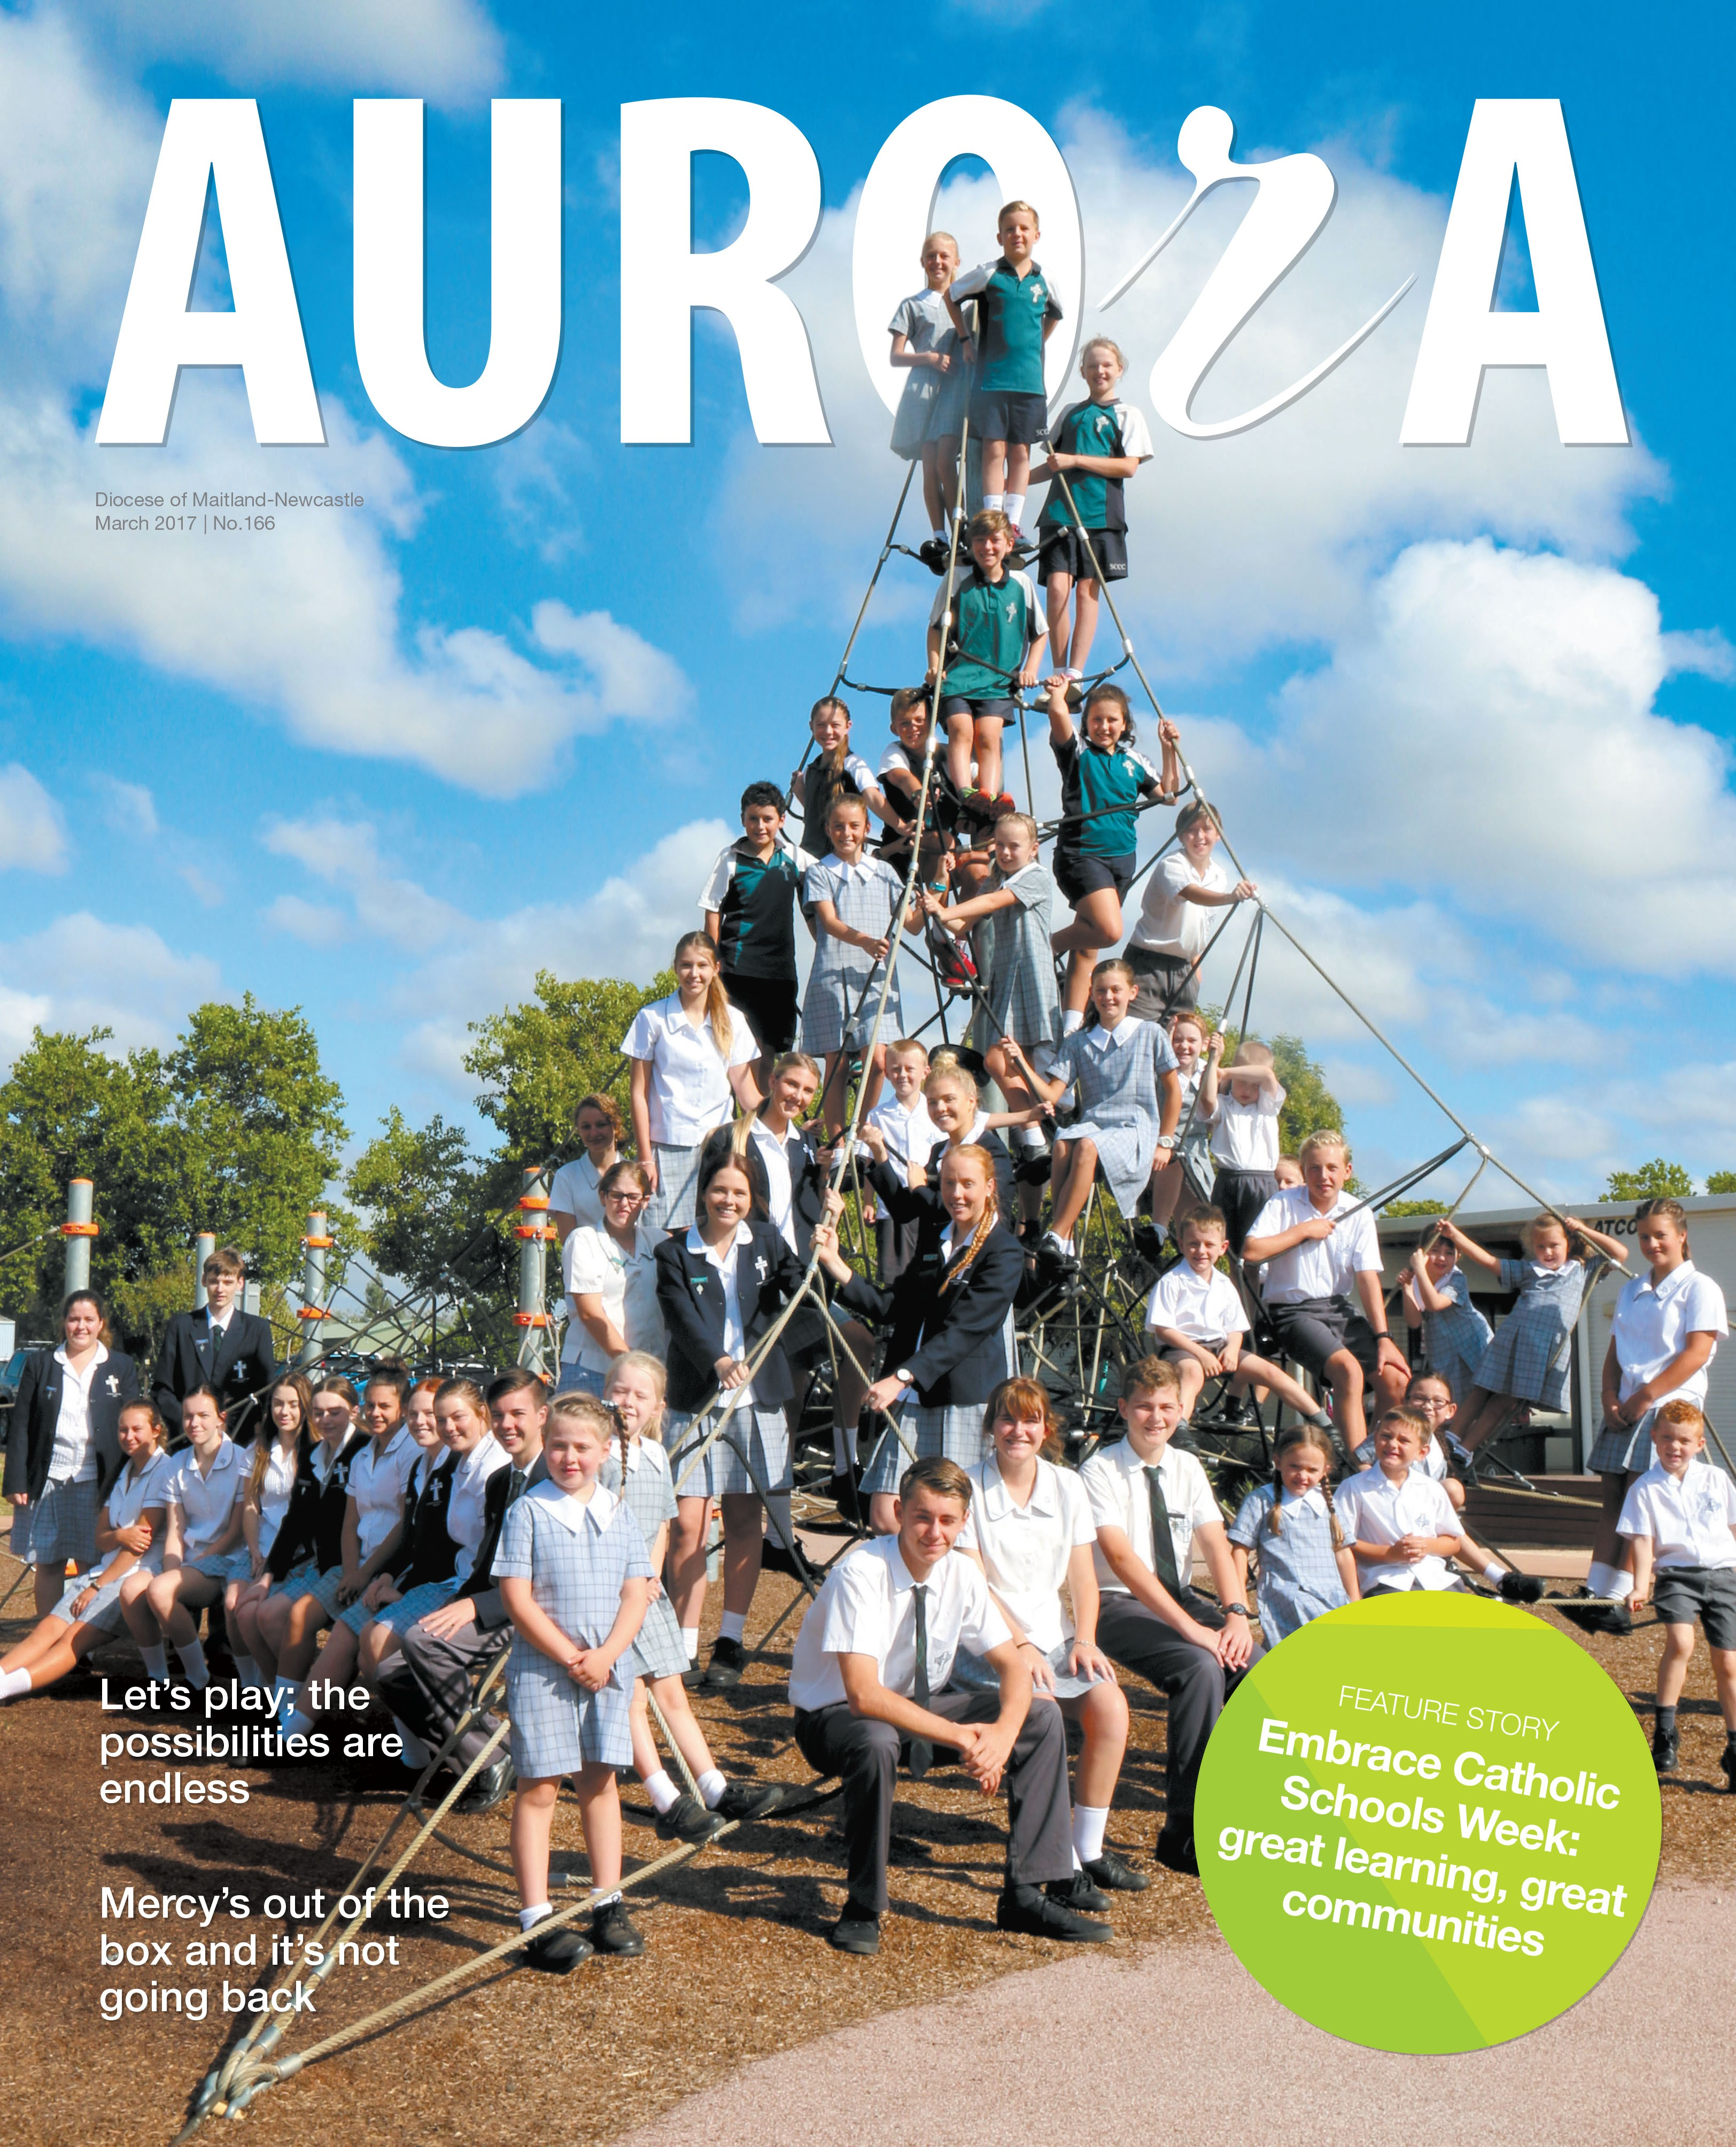 Aurora March 2017 Cover Image